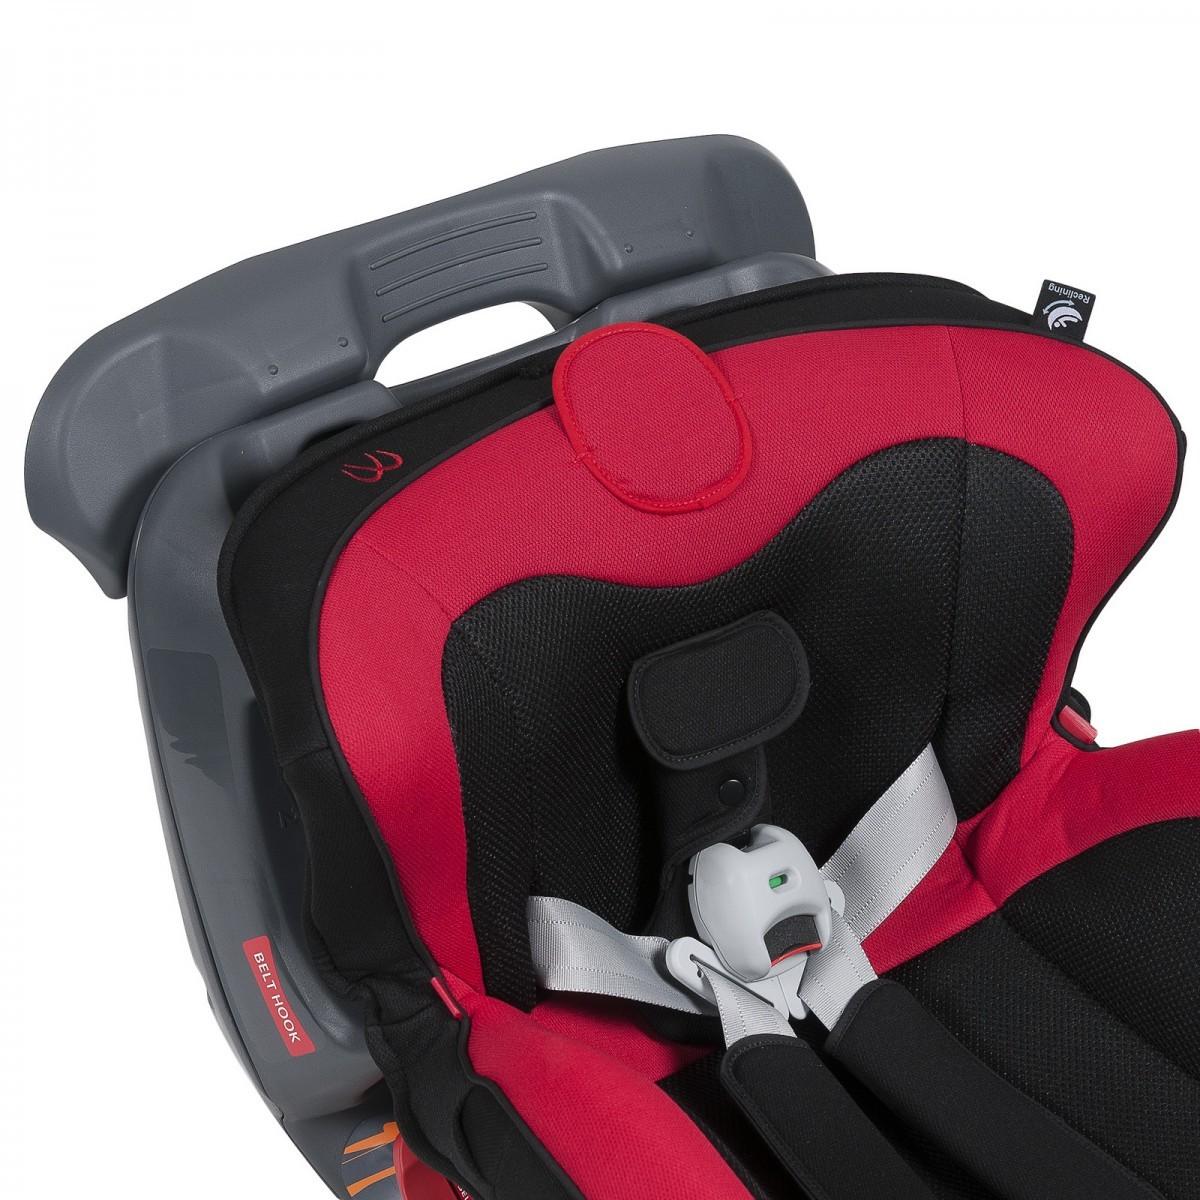 Carmate «Swing Moon» Black Red - Детское автокресло от 9 до 25 кг.